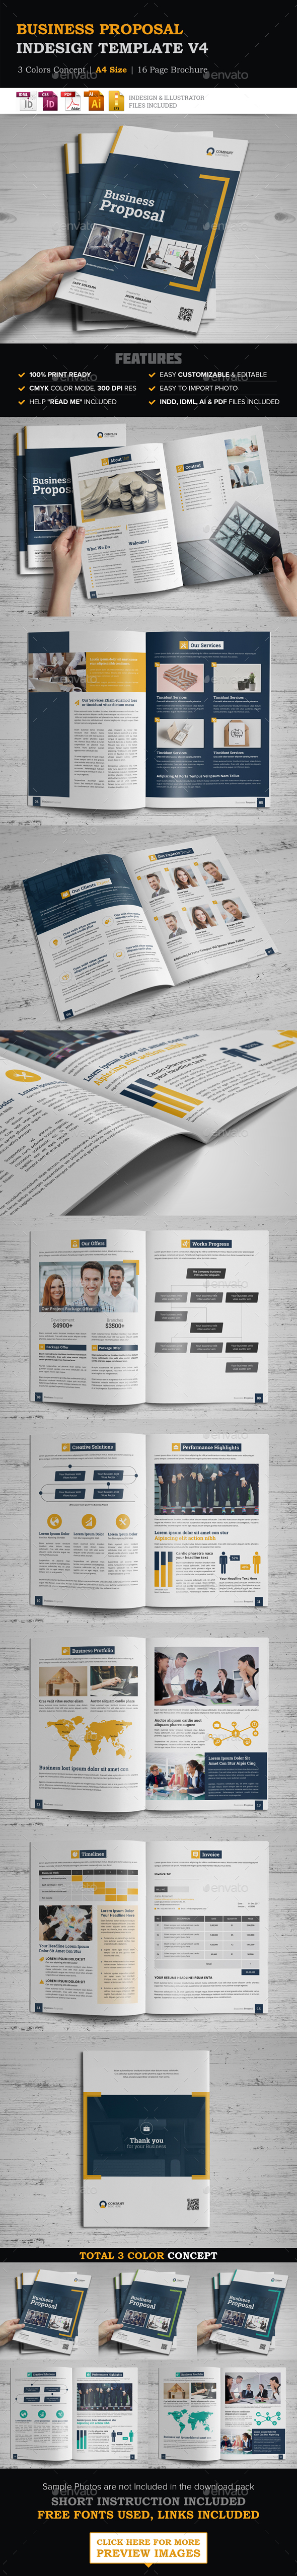 Indesign Proposal Graphics Designs Templates